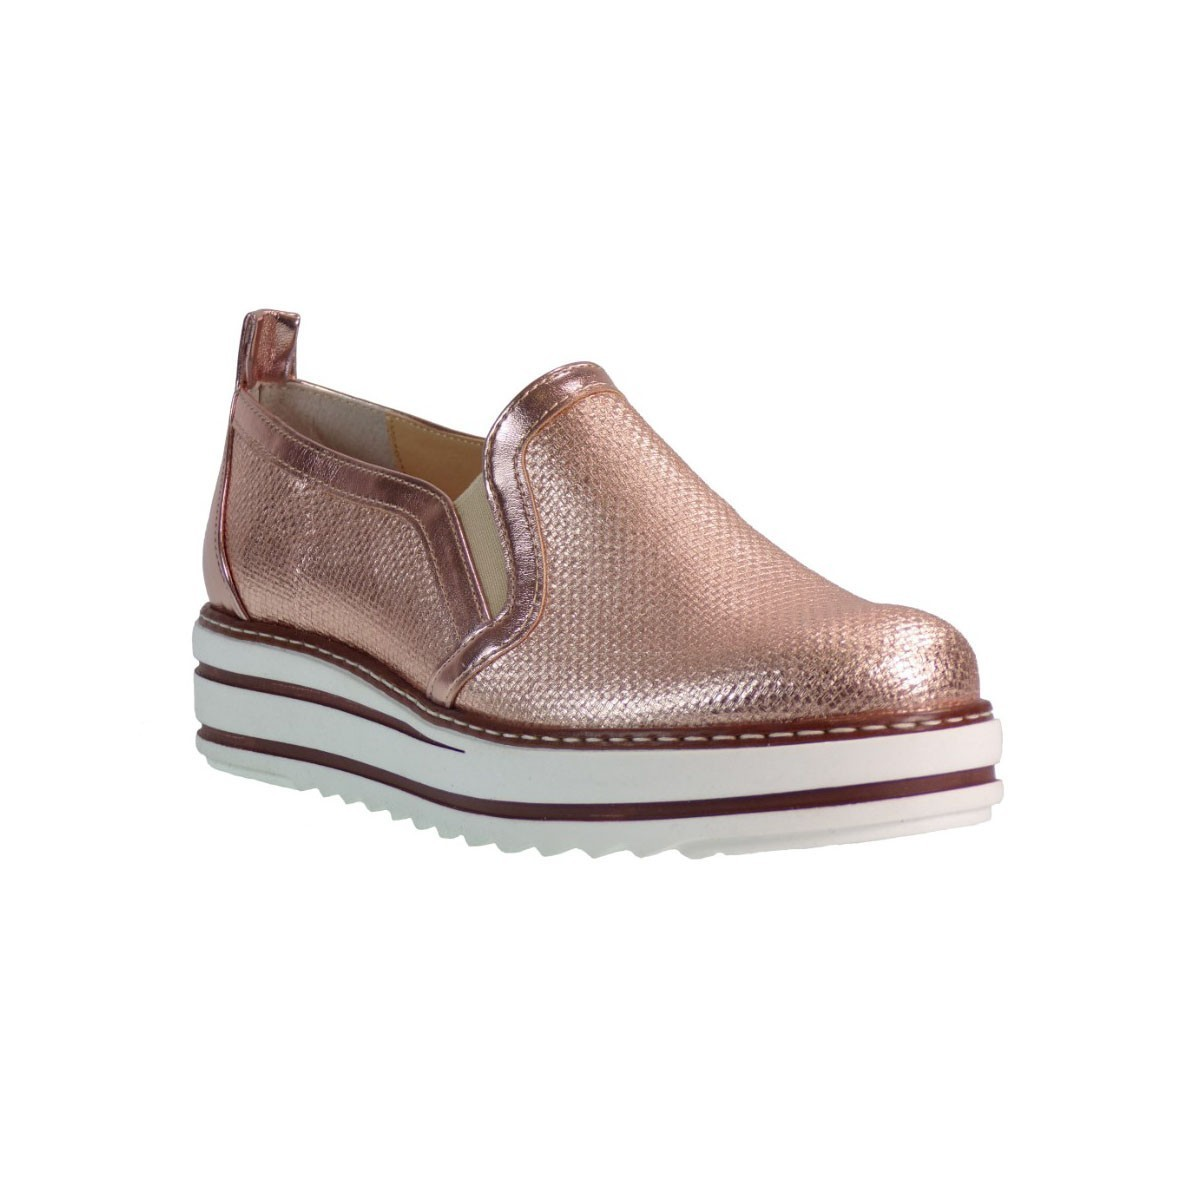 Katia Shoes Γυναικεία Παπούτσια 29Ρ Χαλκός Ψάθα Katia shoes 29 Ρ Χαλκός